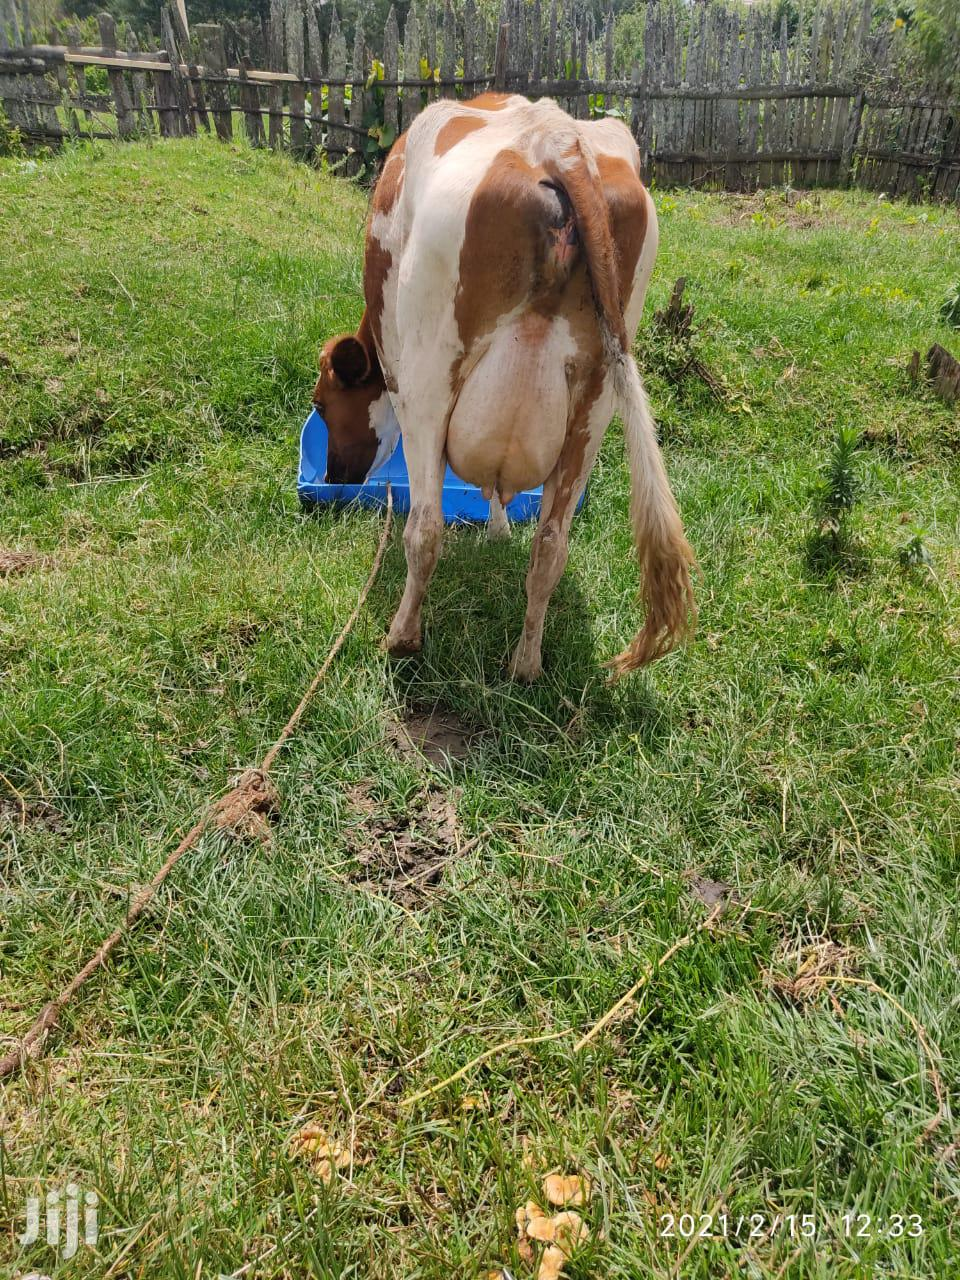 Dairy Cows And Incalf Heifers For Sale | Livestock & Poultry for sale in NjabiniKiburu, Nyandarua, Kenya